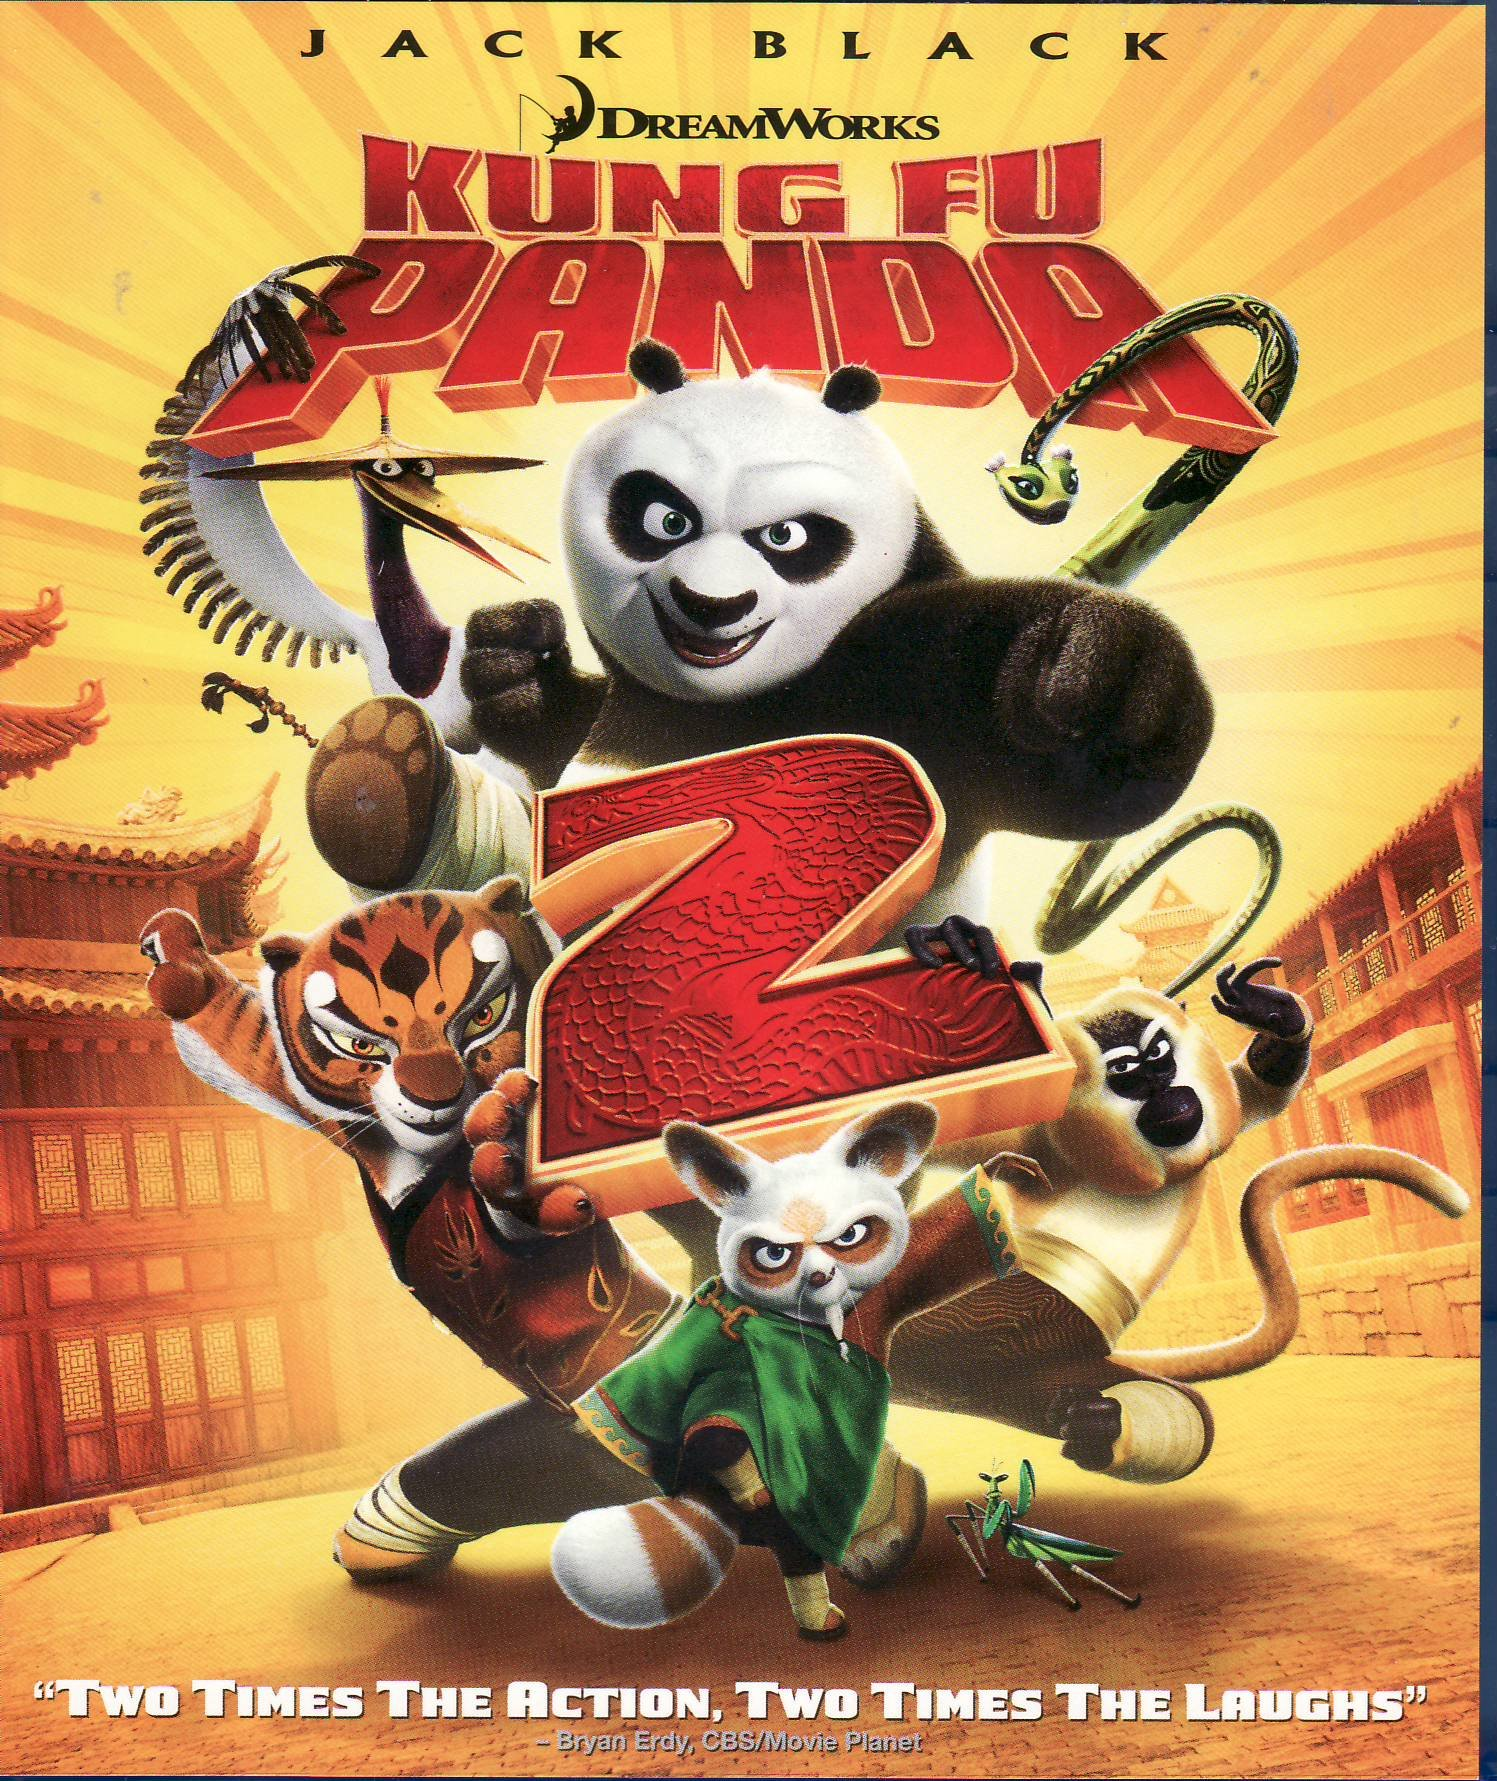 Kung Fu Panda Black Blu ray product image